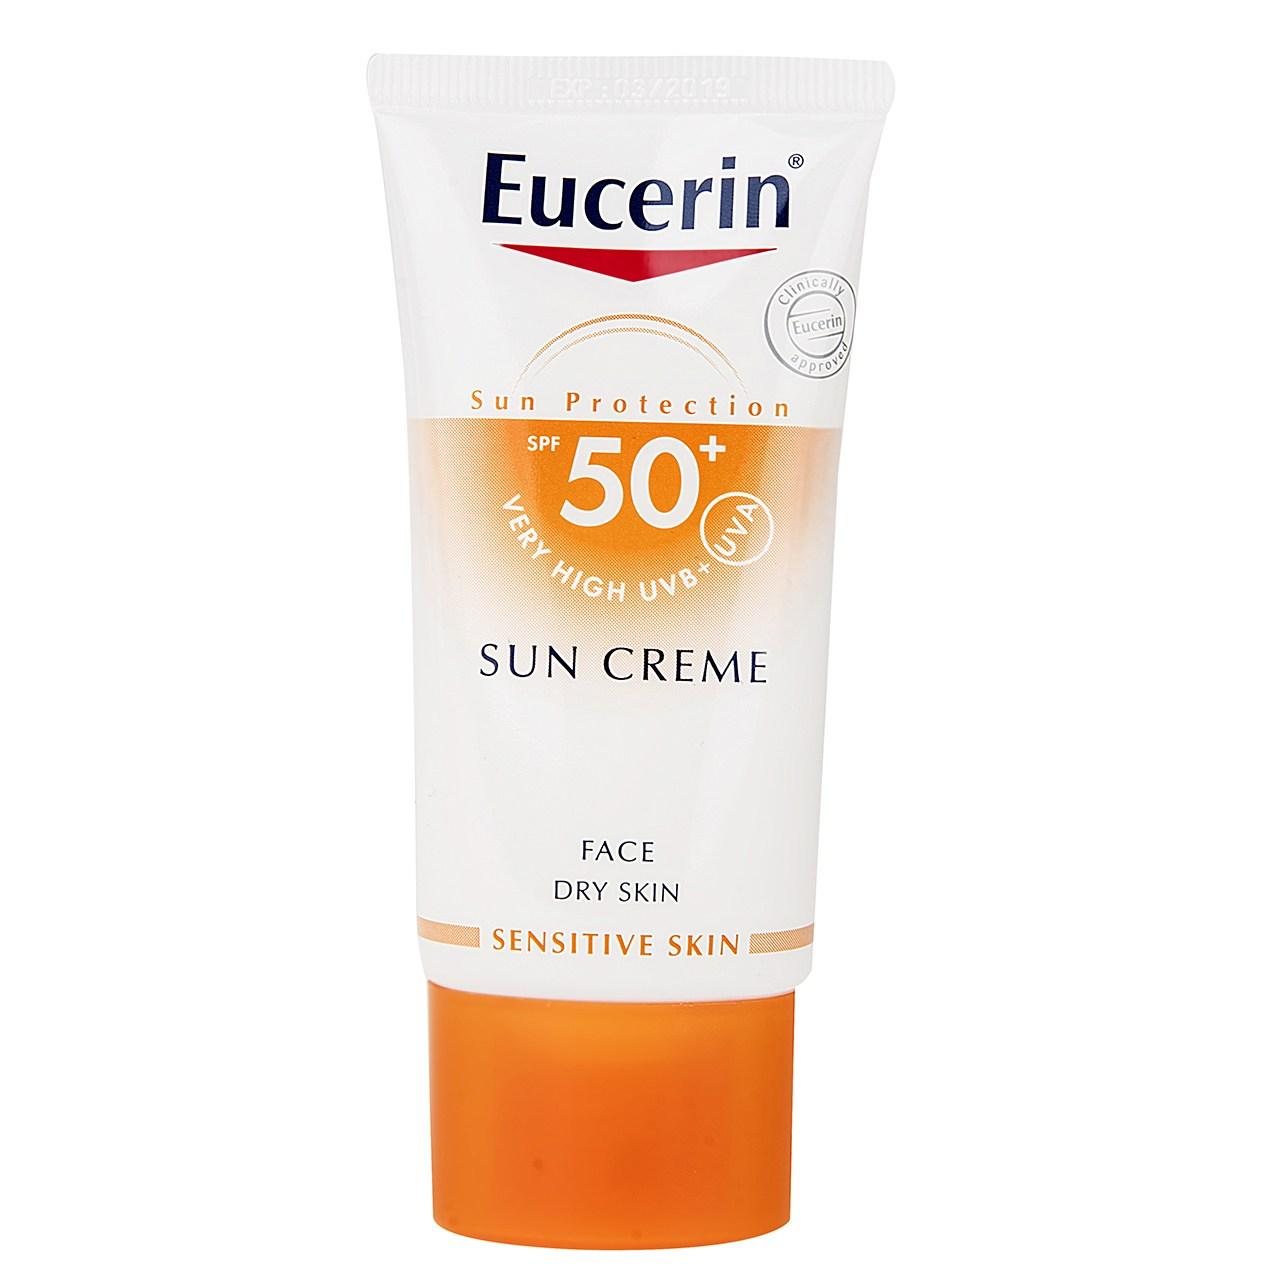 کرم ضد آفتاب اوسرین سری Sun Protection Spf50 حجم 50 میلی لیتر